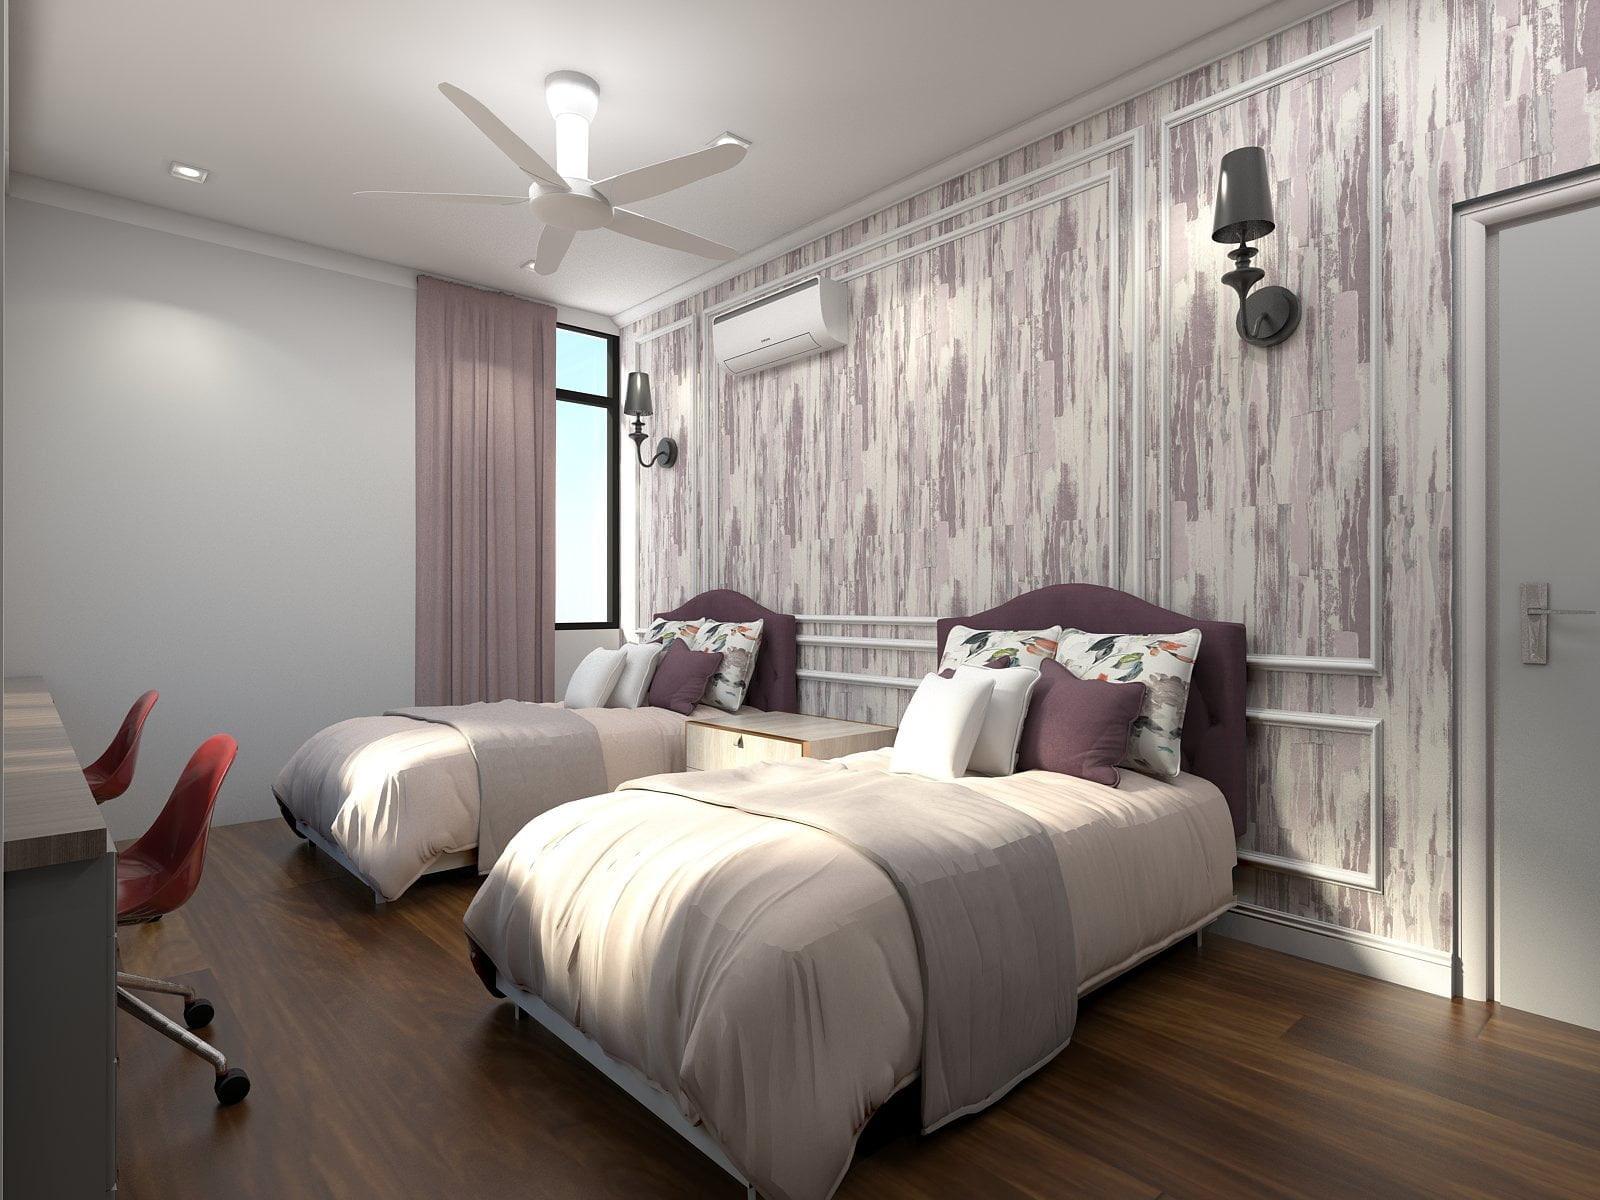 Laurea Home Furnishing Quotation Request | Laurea 2